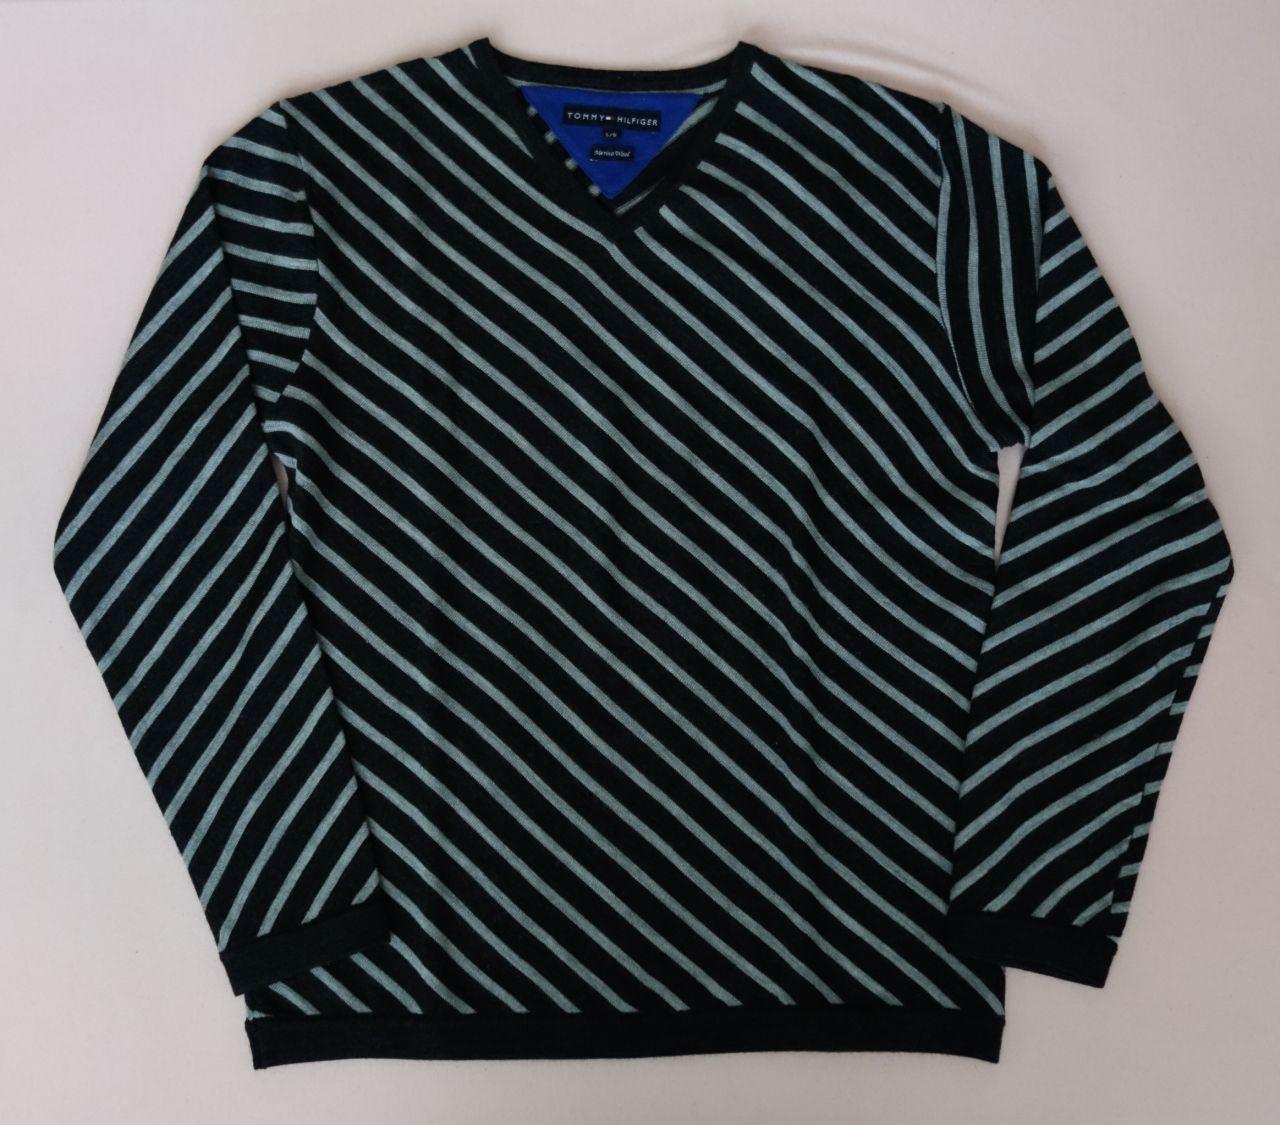 Pánsky sveter tommy hilfiger - top stav f0674062061